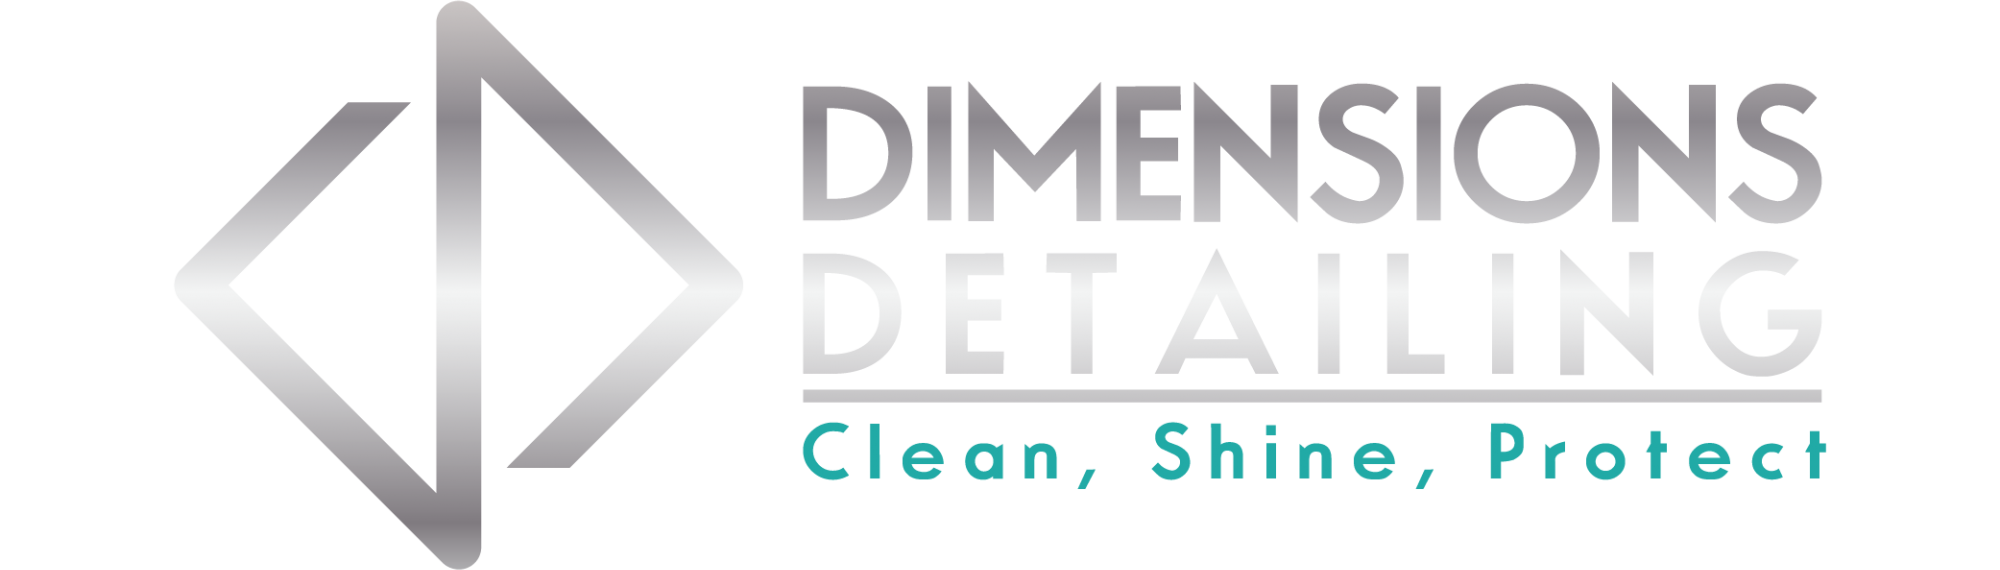 Dimensions Detailing